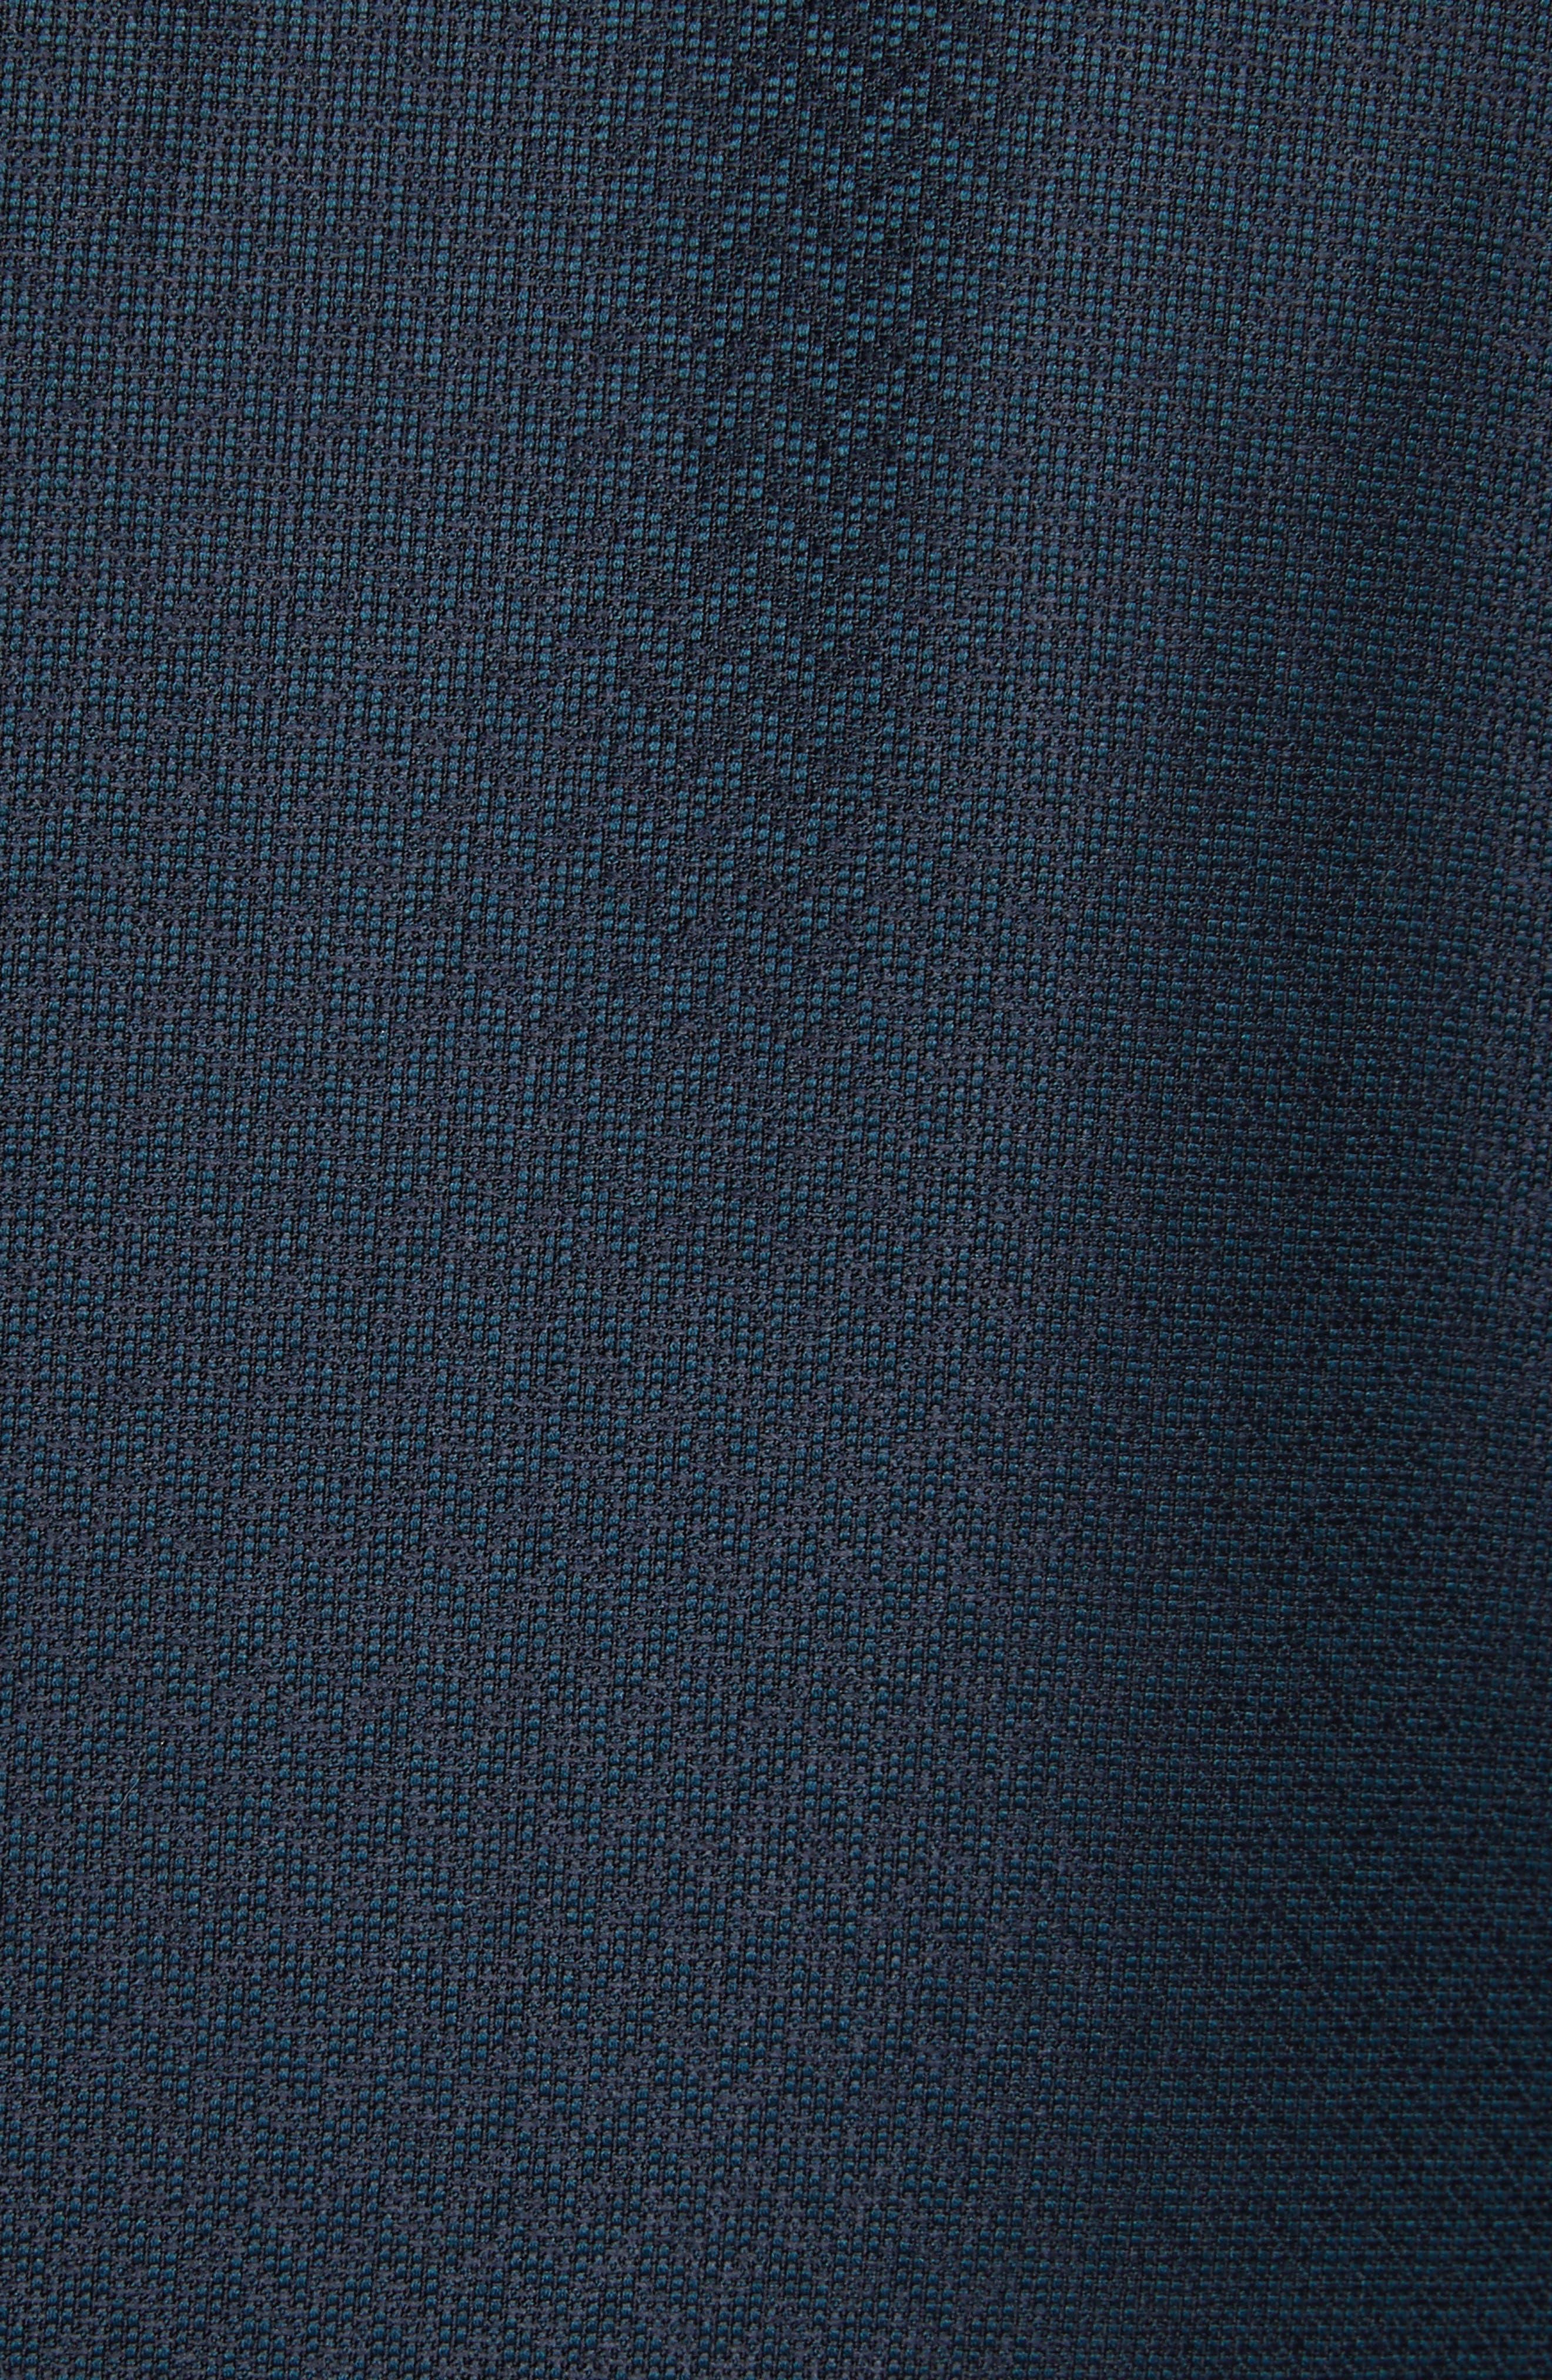 G-Line Trim Fit Wool Dinner Jacket,                             Alternate thumbnail 5, color,                             Blue